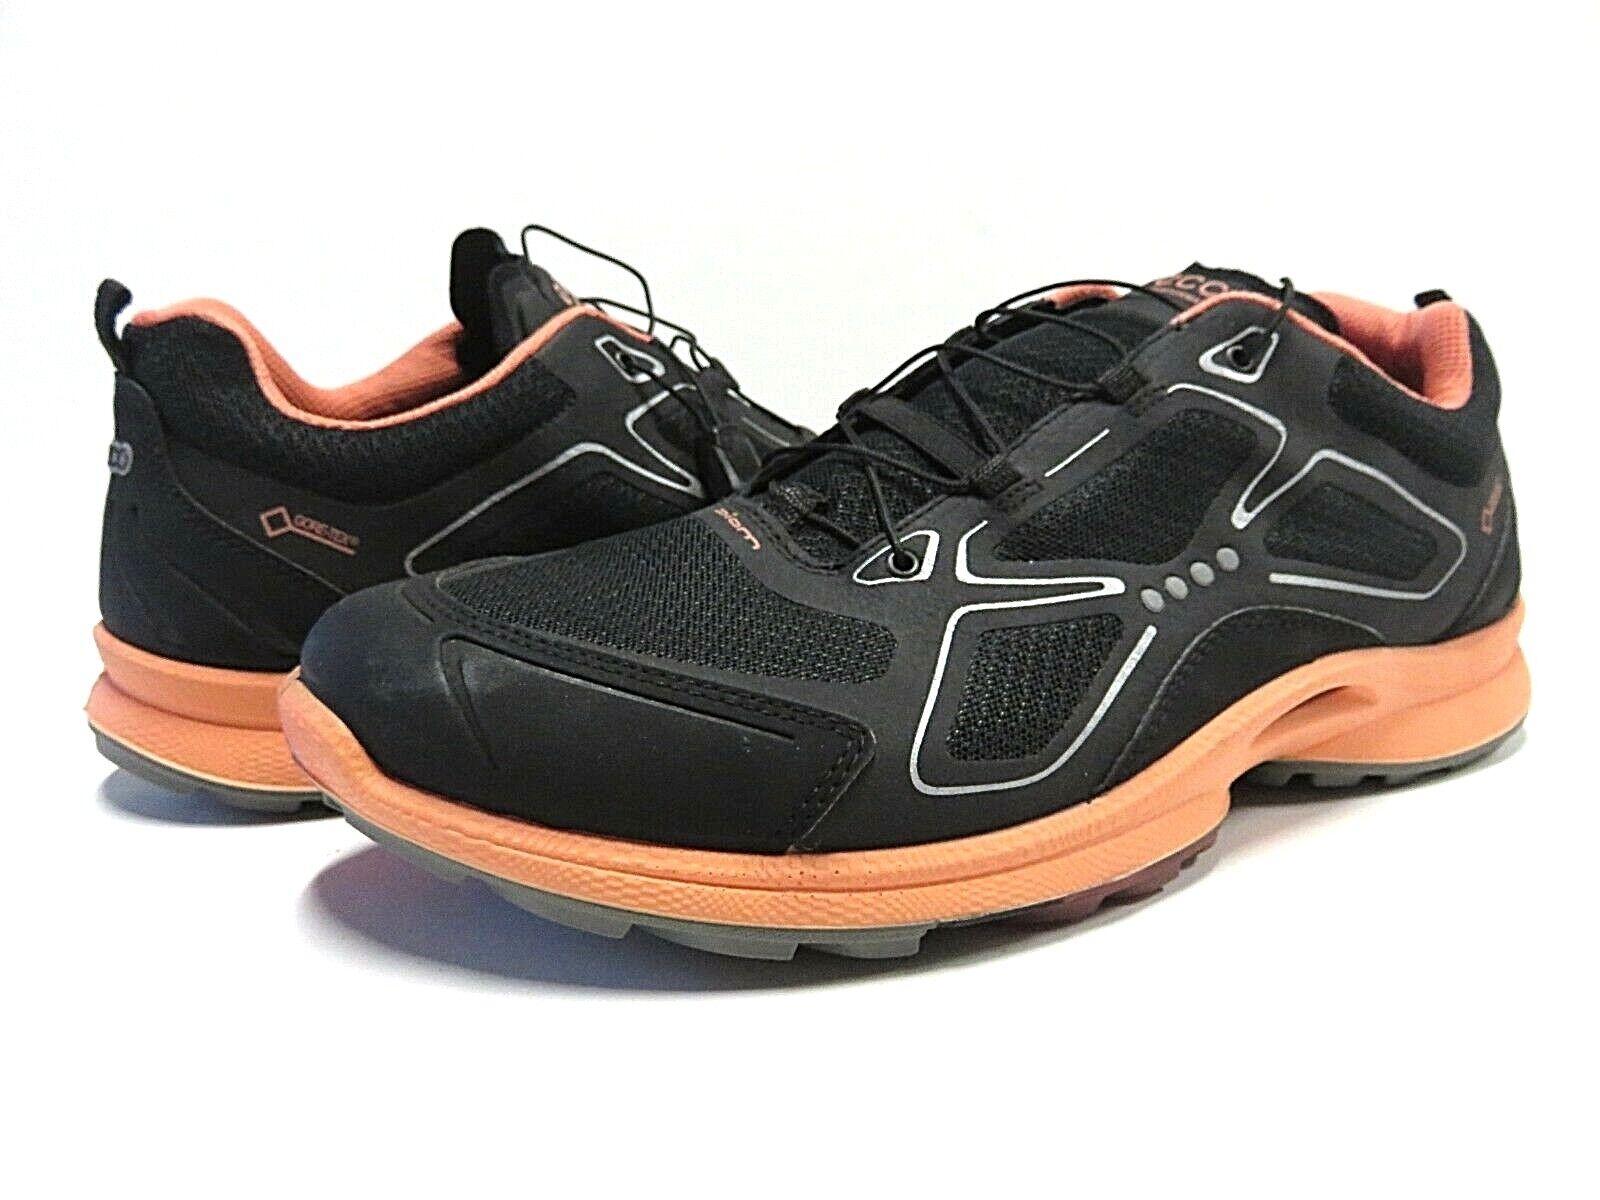 NEW ECCO Performance Biom Black & orange Athletic Athletic Athletic Running shoes Women's Size 10 7abb83